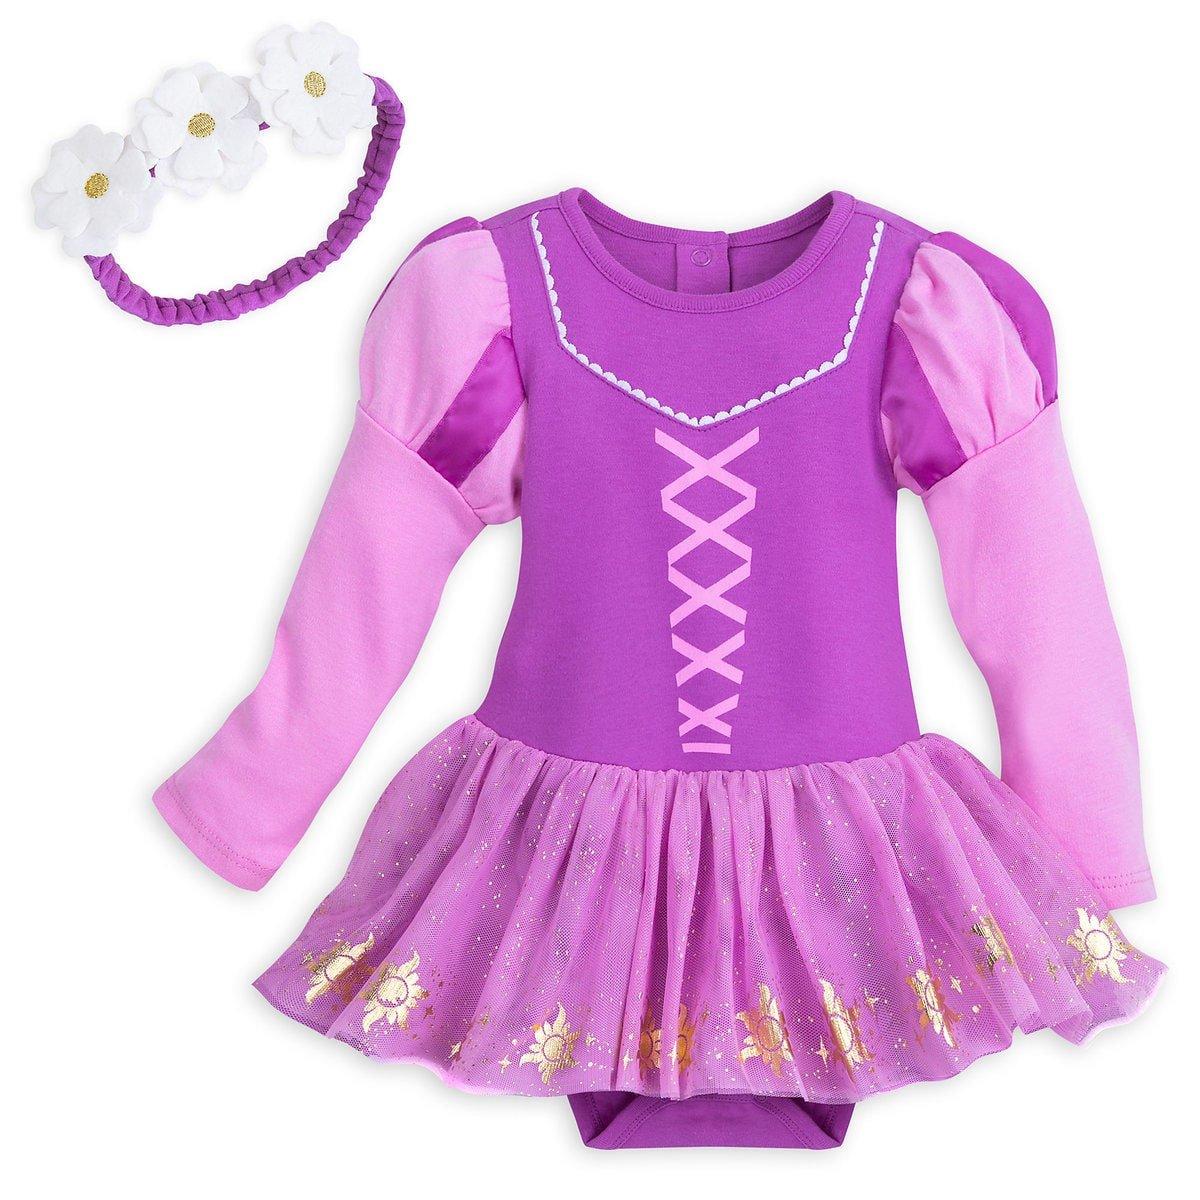 Disney Store Rapunzel Baby Costume 0-3 Months 2018 New